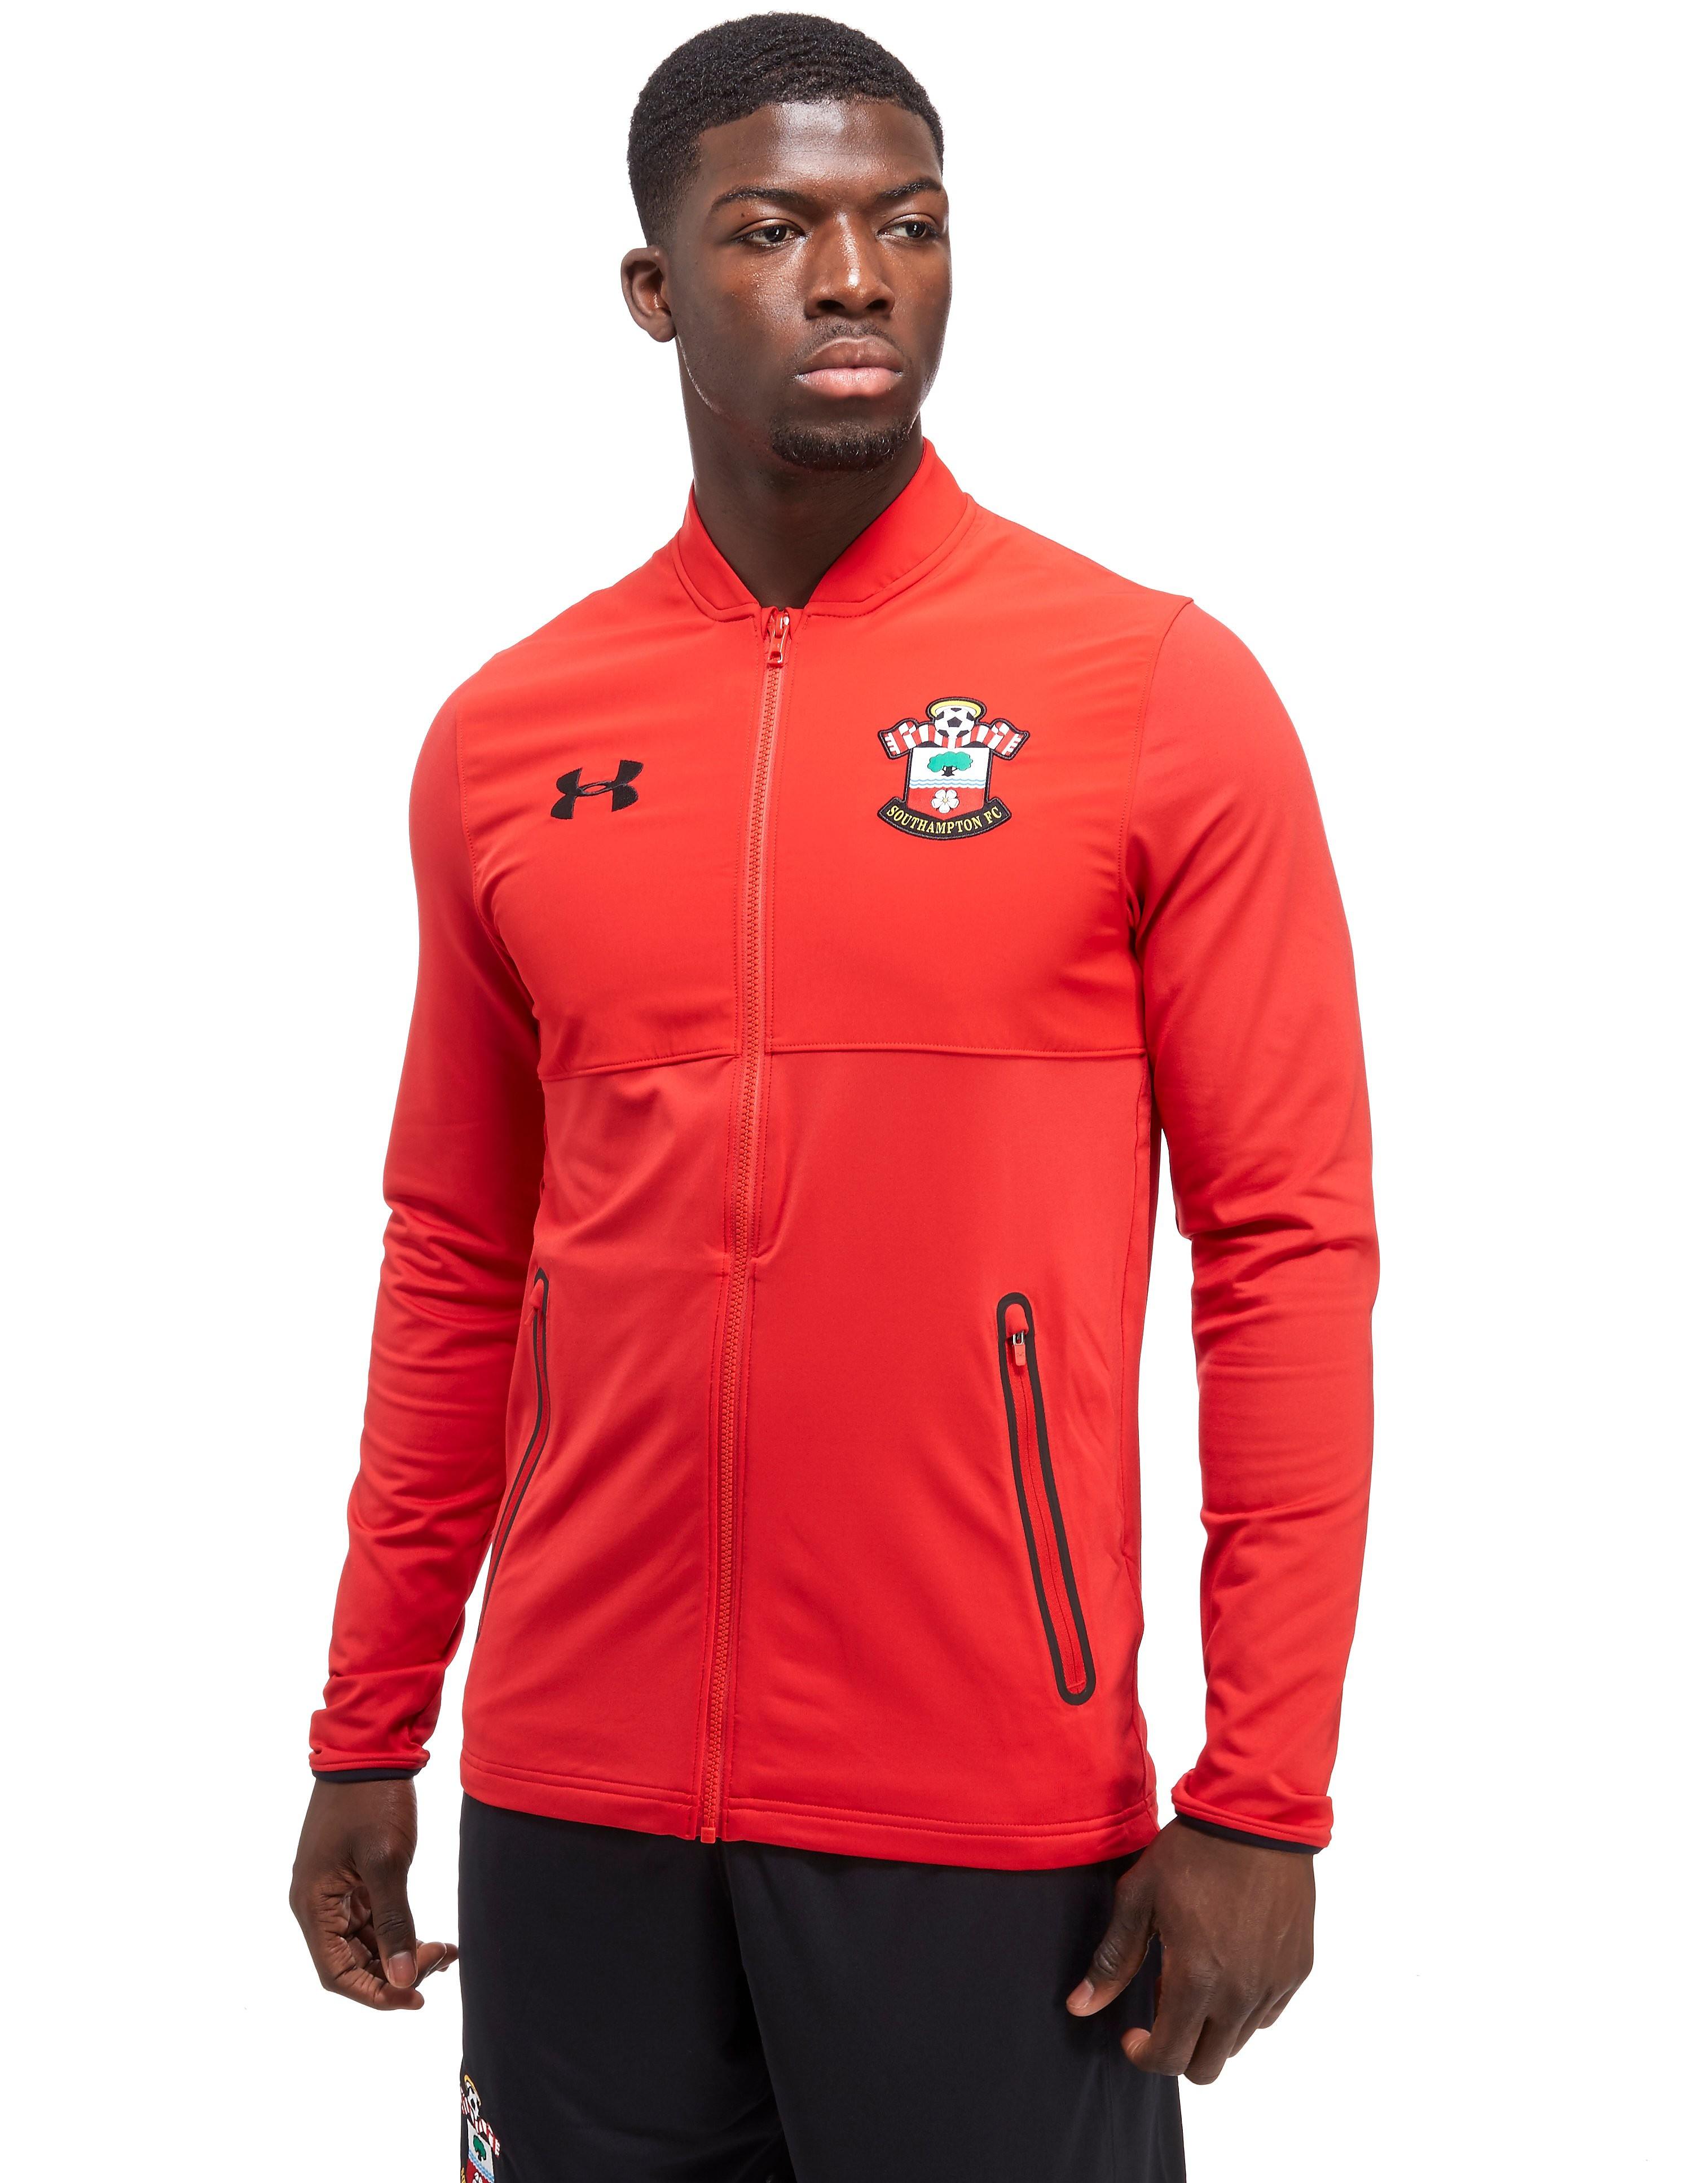 Under Armour Southampton FC 2017 Stadium Jacket